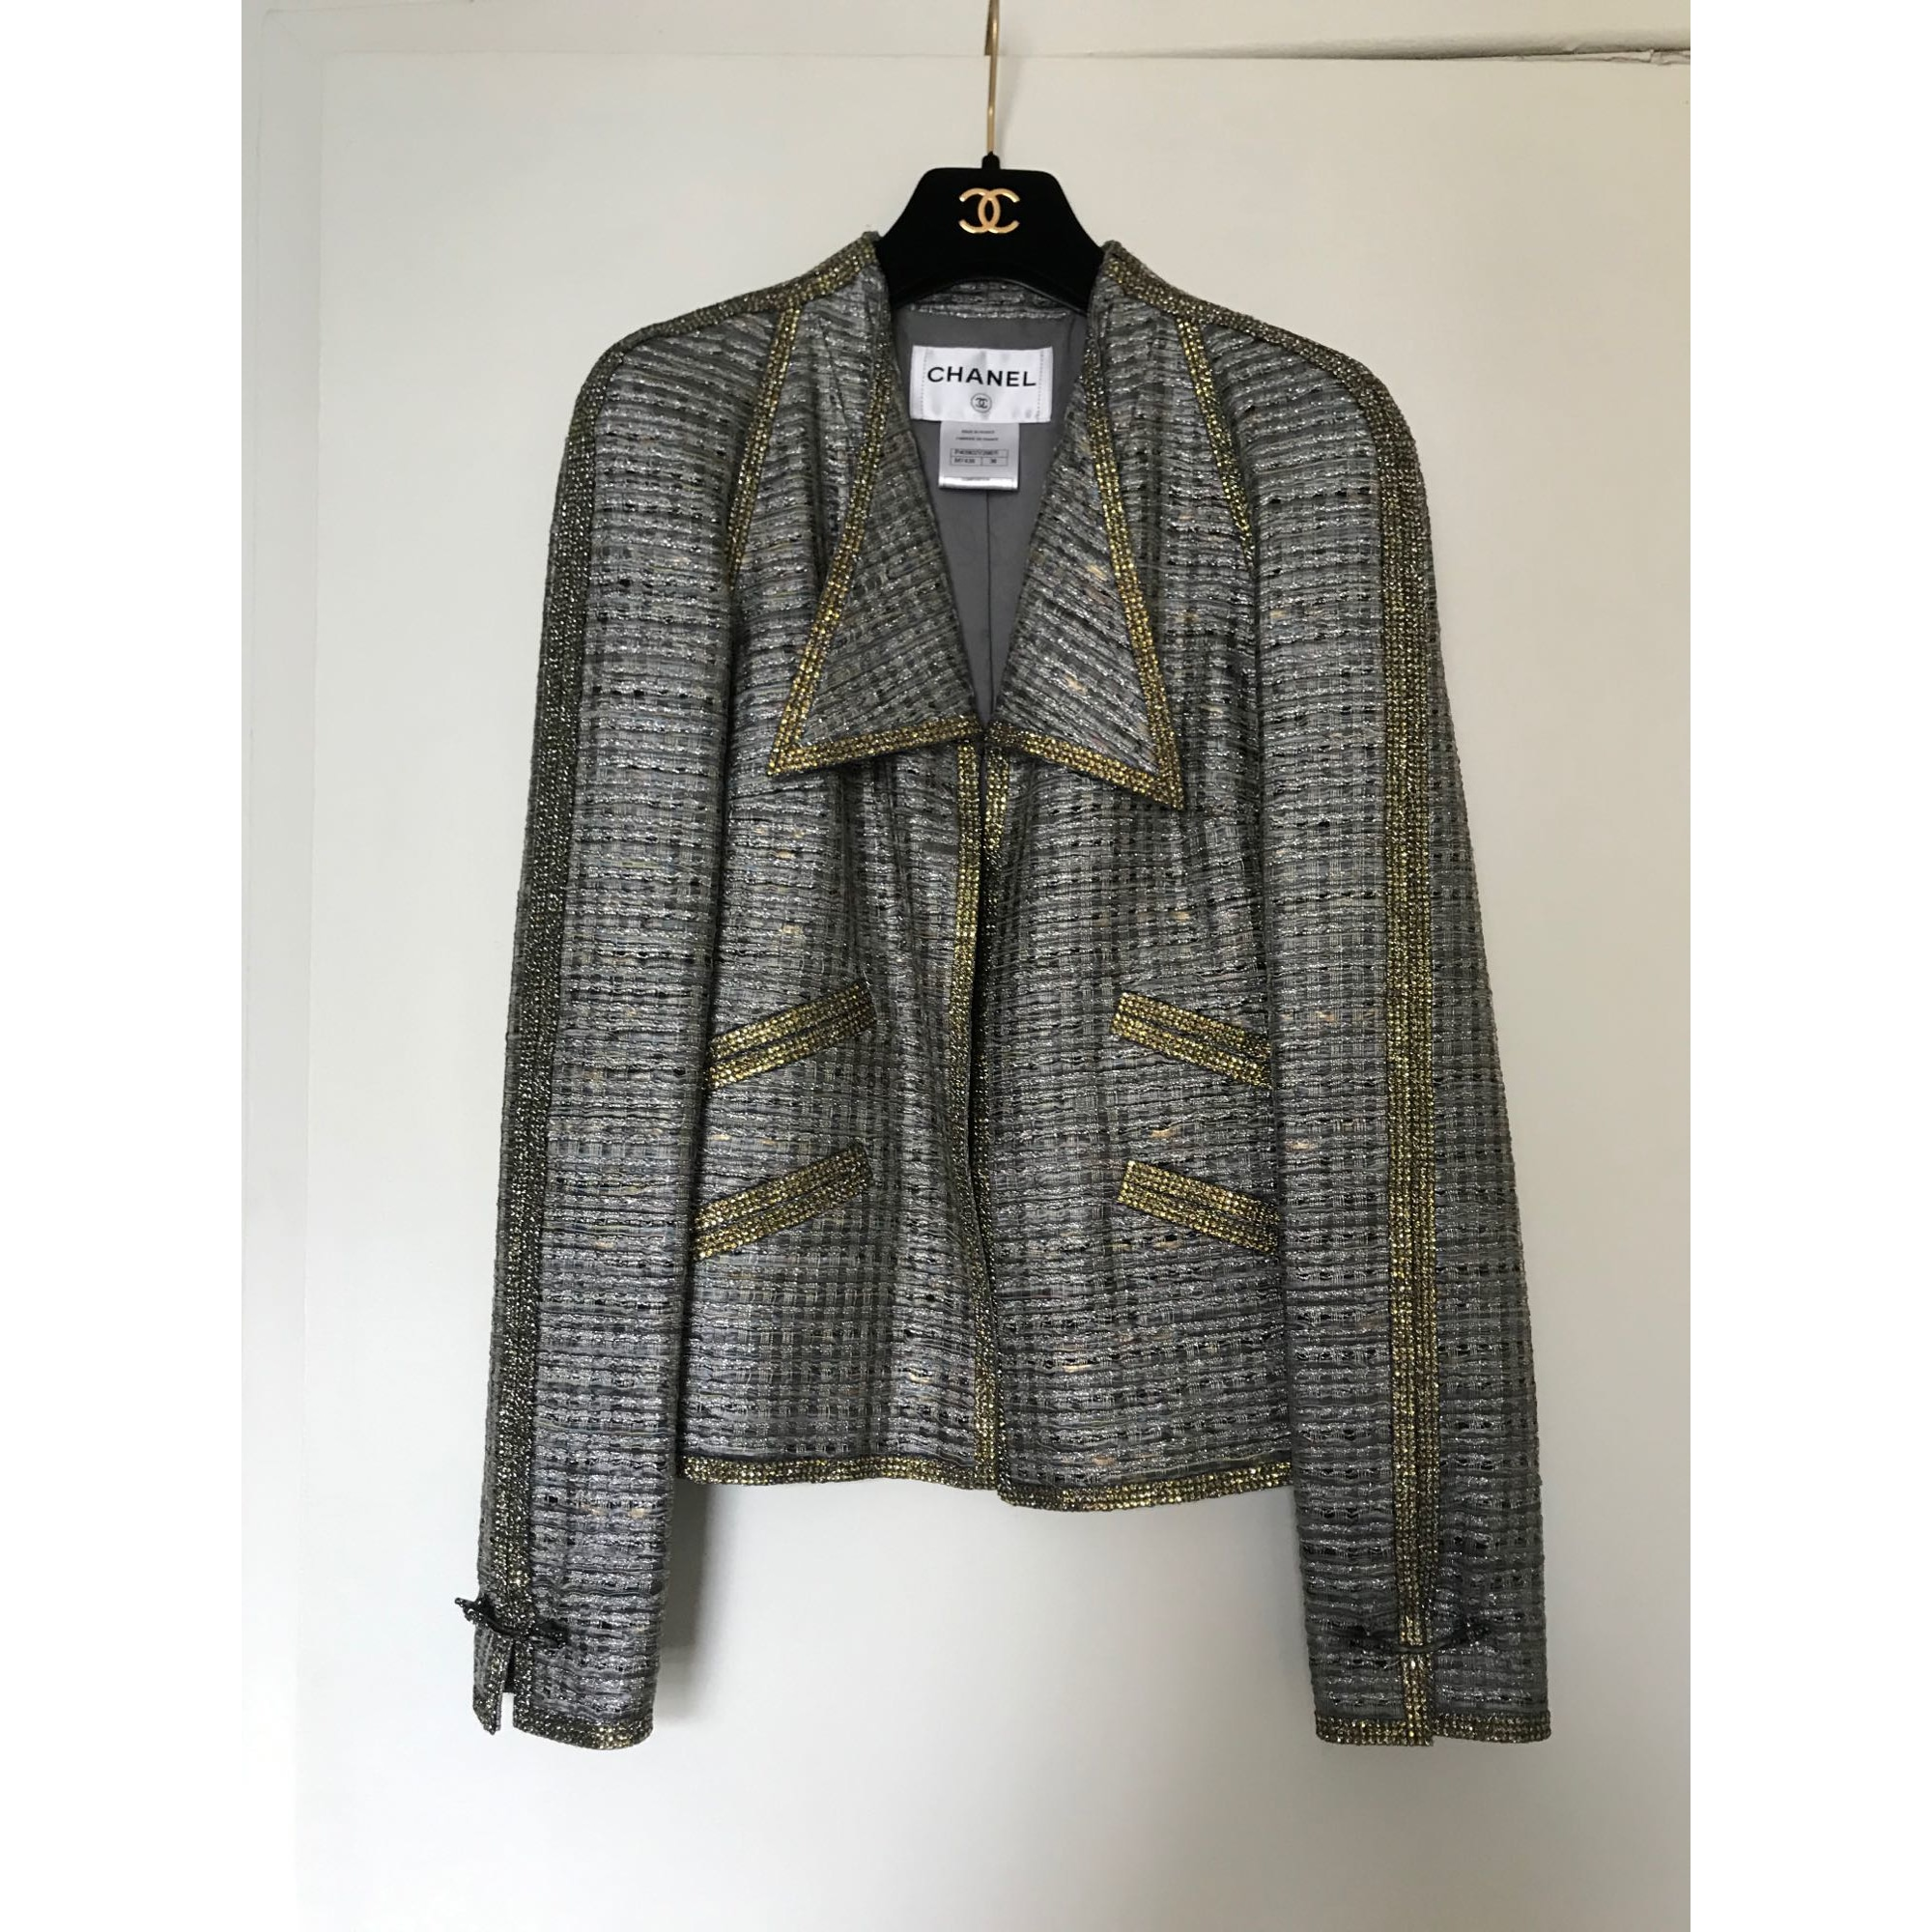 Blazer, veste tailleur CHANEL Gris, anthracite